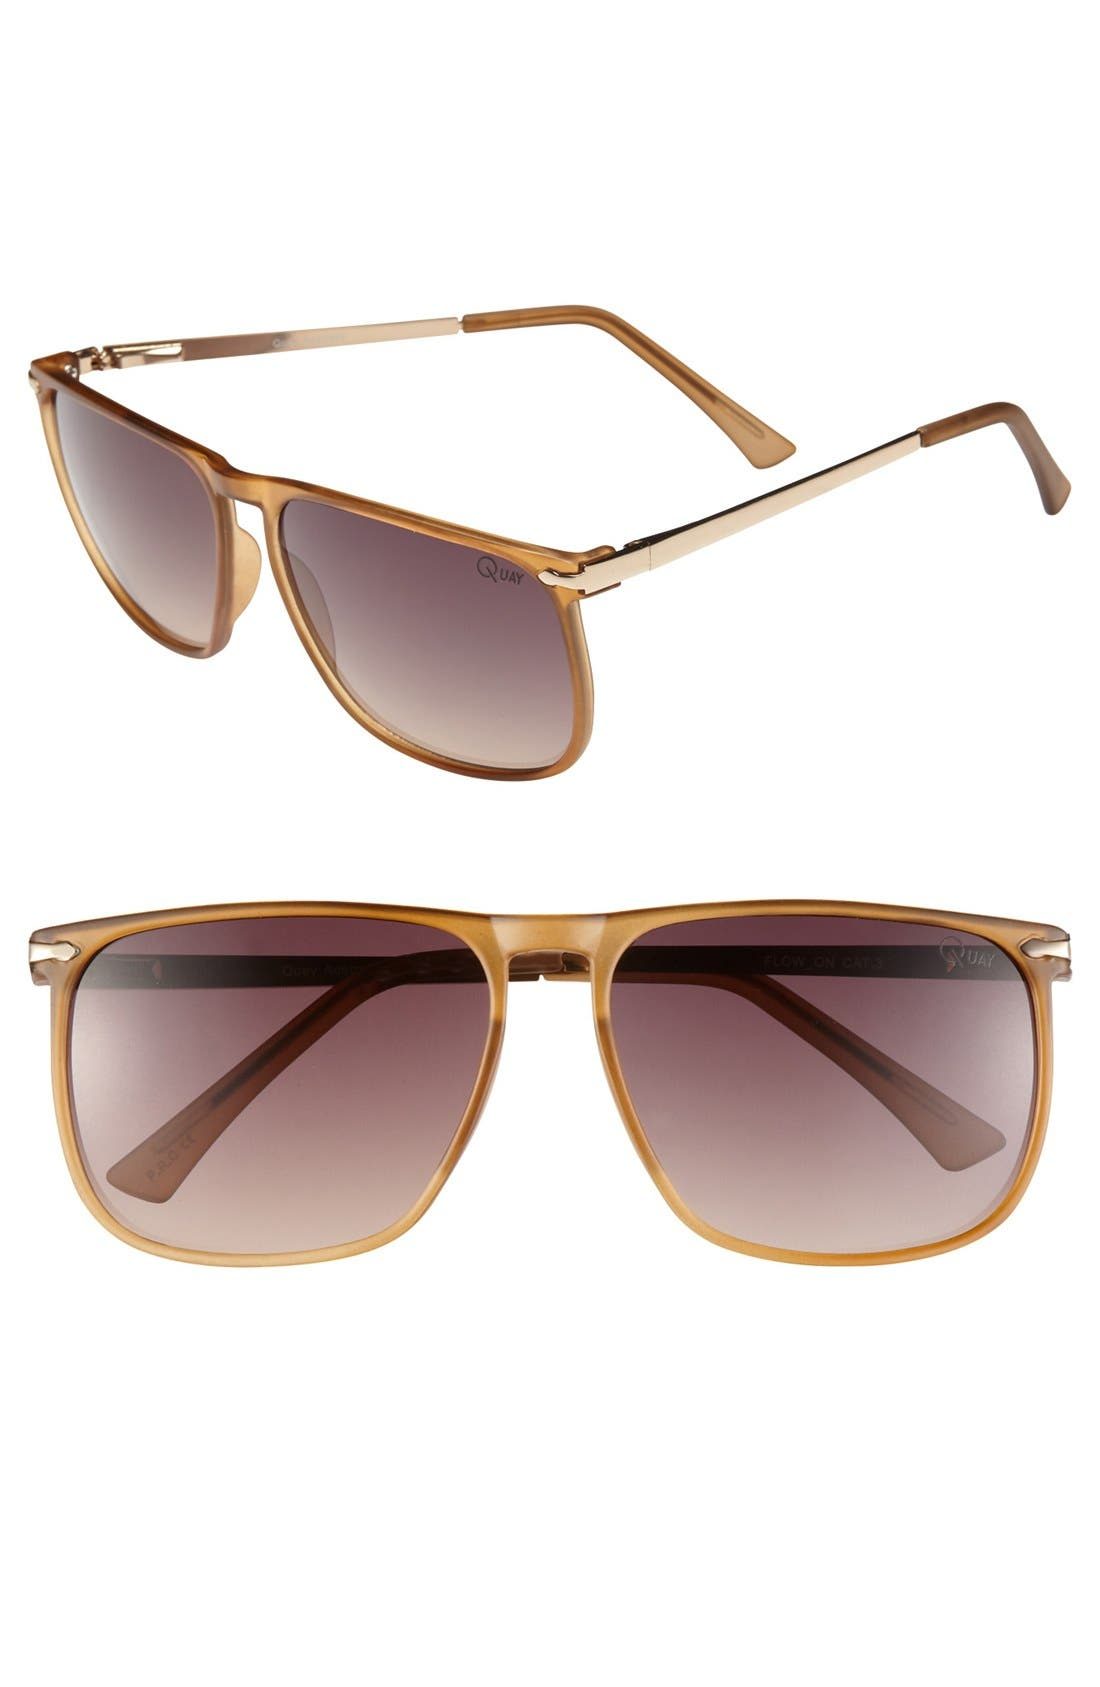 Alternate Image 1 Selected - Quay 'Follow On' Sunglasses